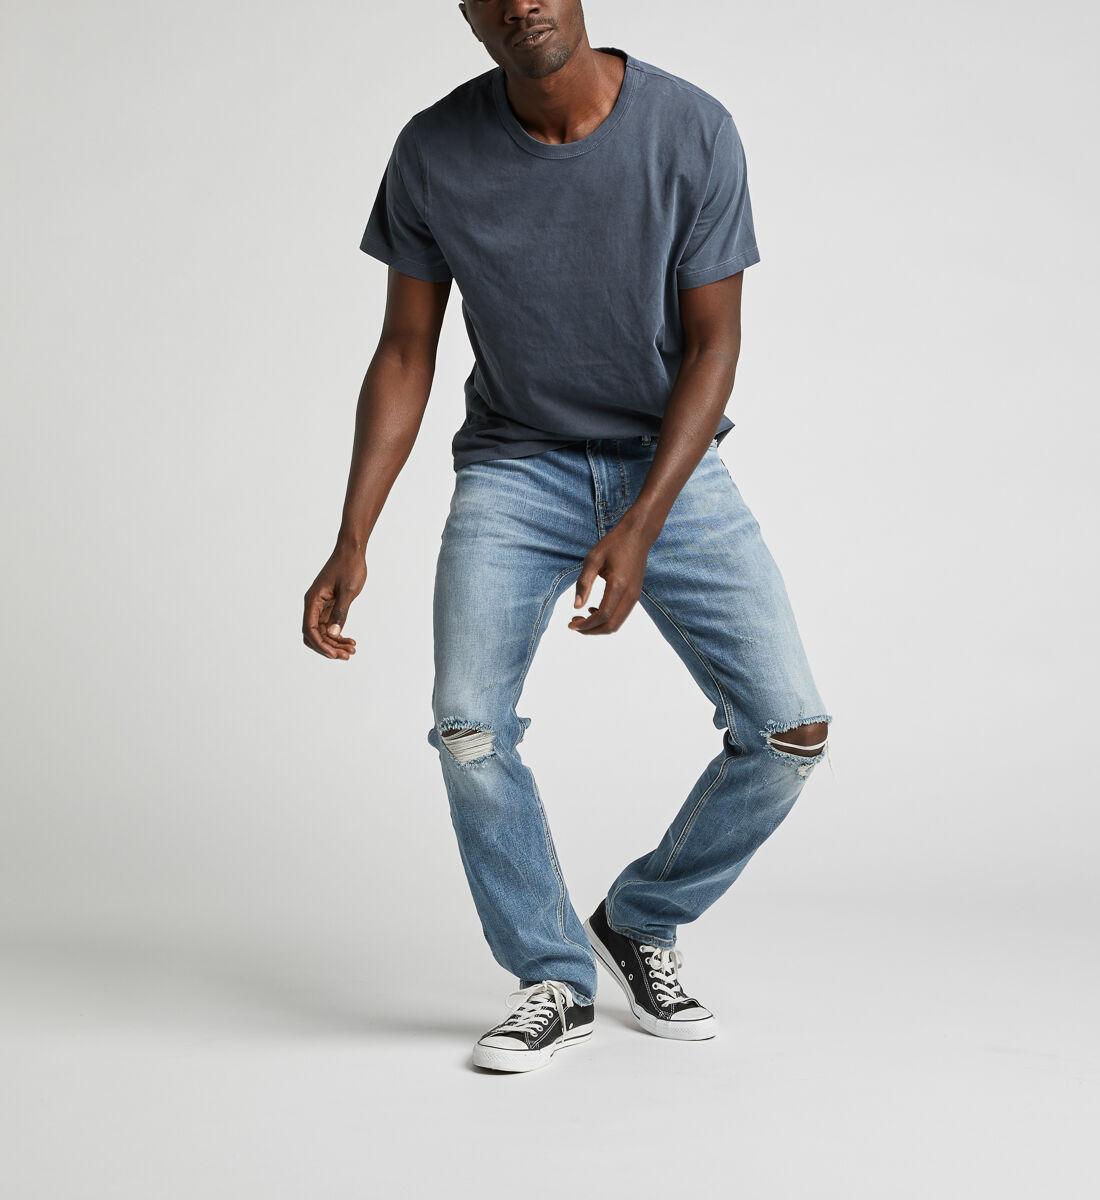 Konrad Slim Fit Slim Leg Jeans Alt Image 1